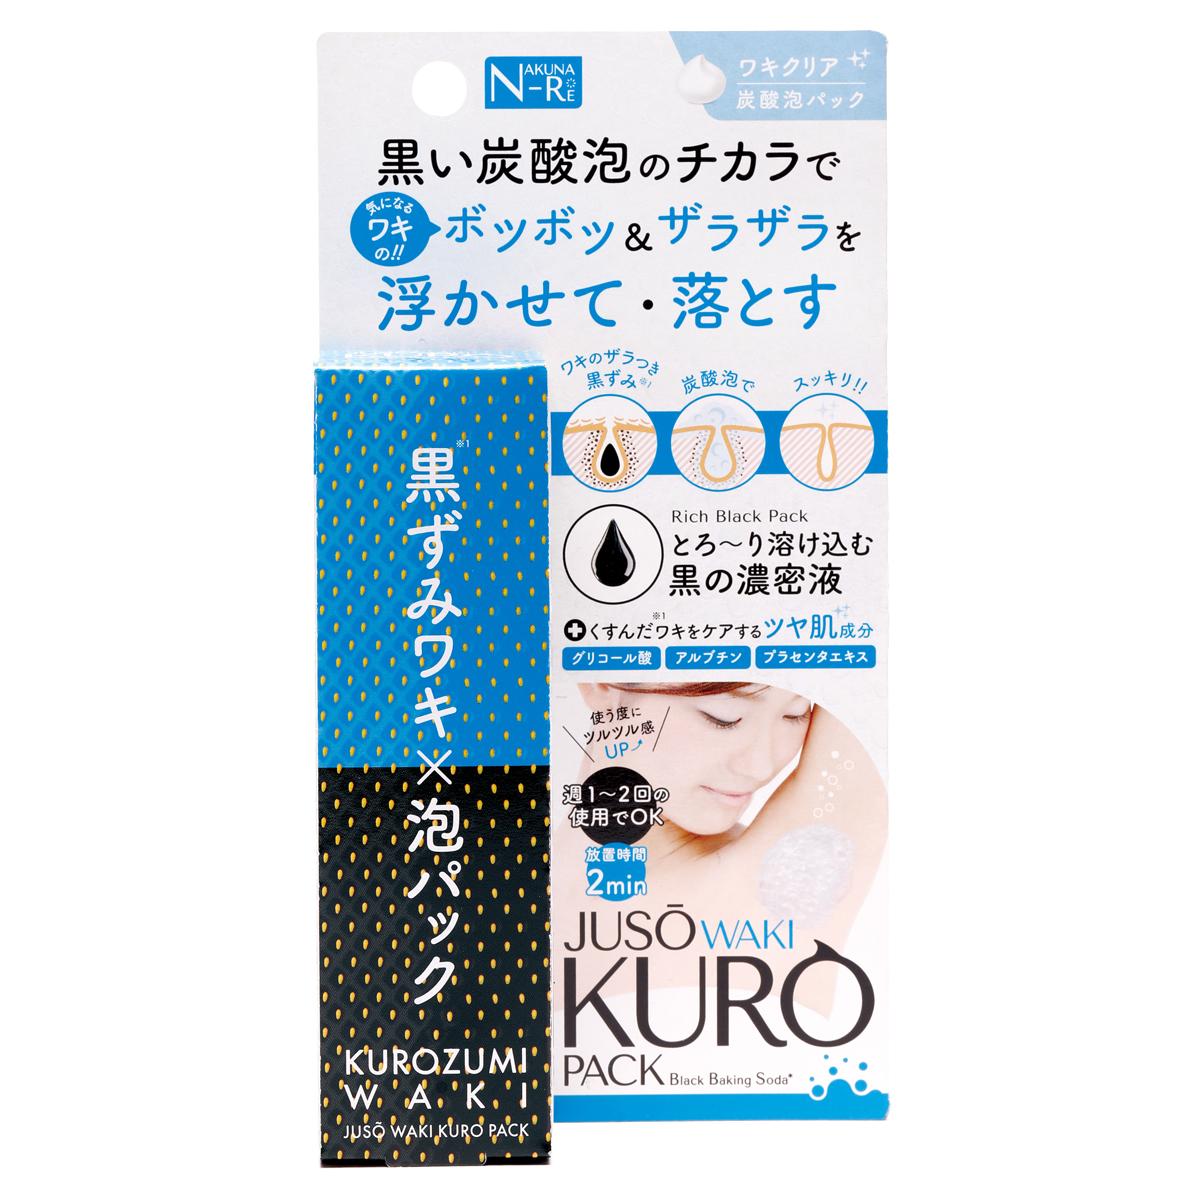 JUSO WAKI KURO PACK[重曹炭酸泡パック(ワキ用)]